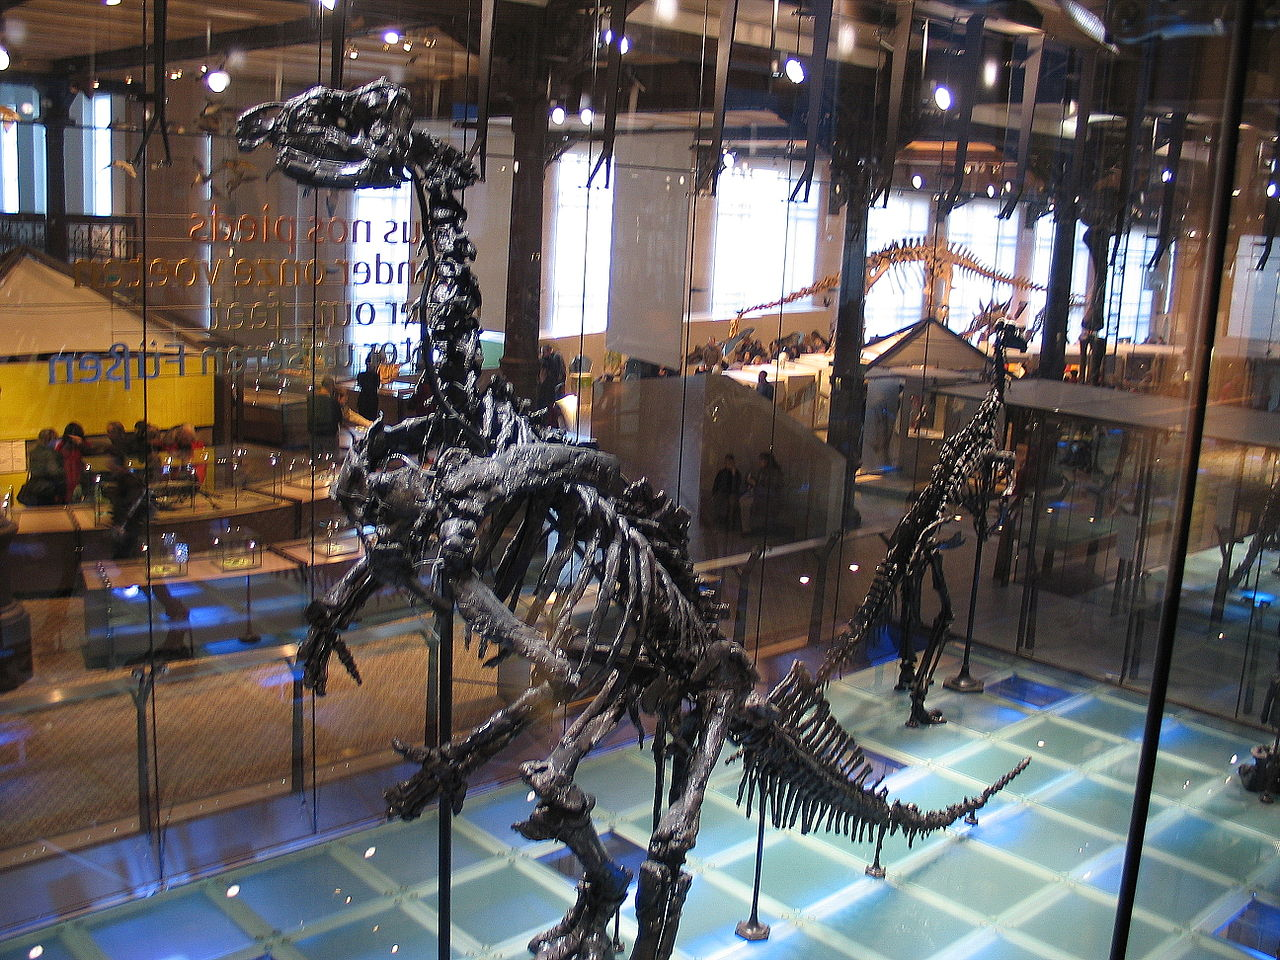 1280px-Iguanodon3_28-12-2007_14-20-18.jpg